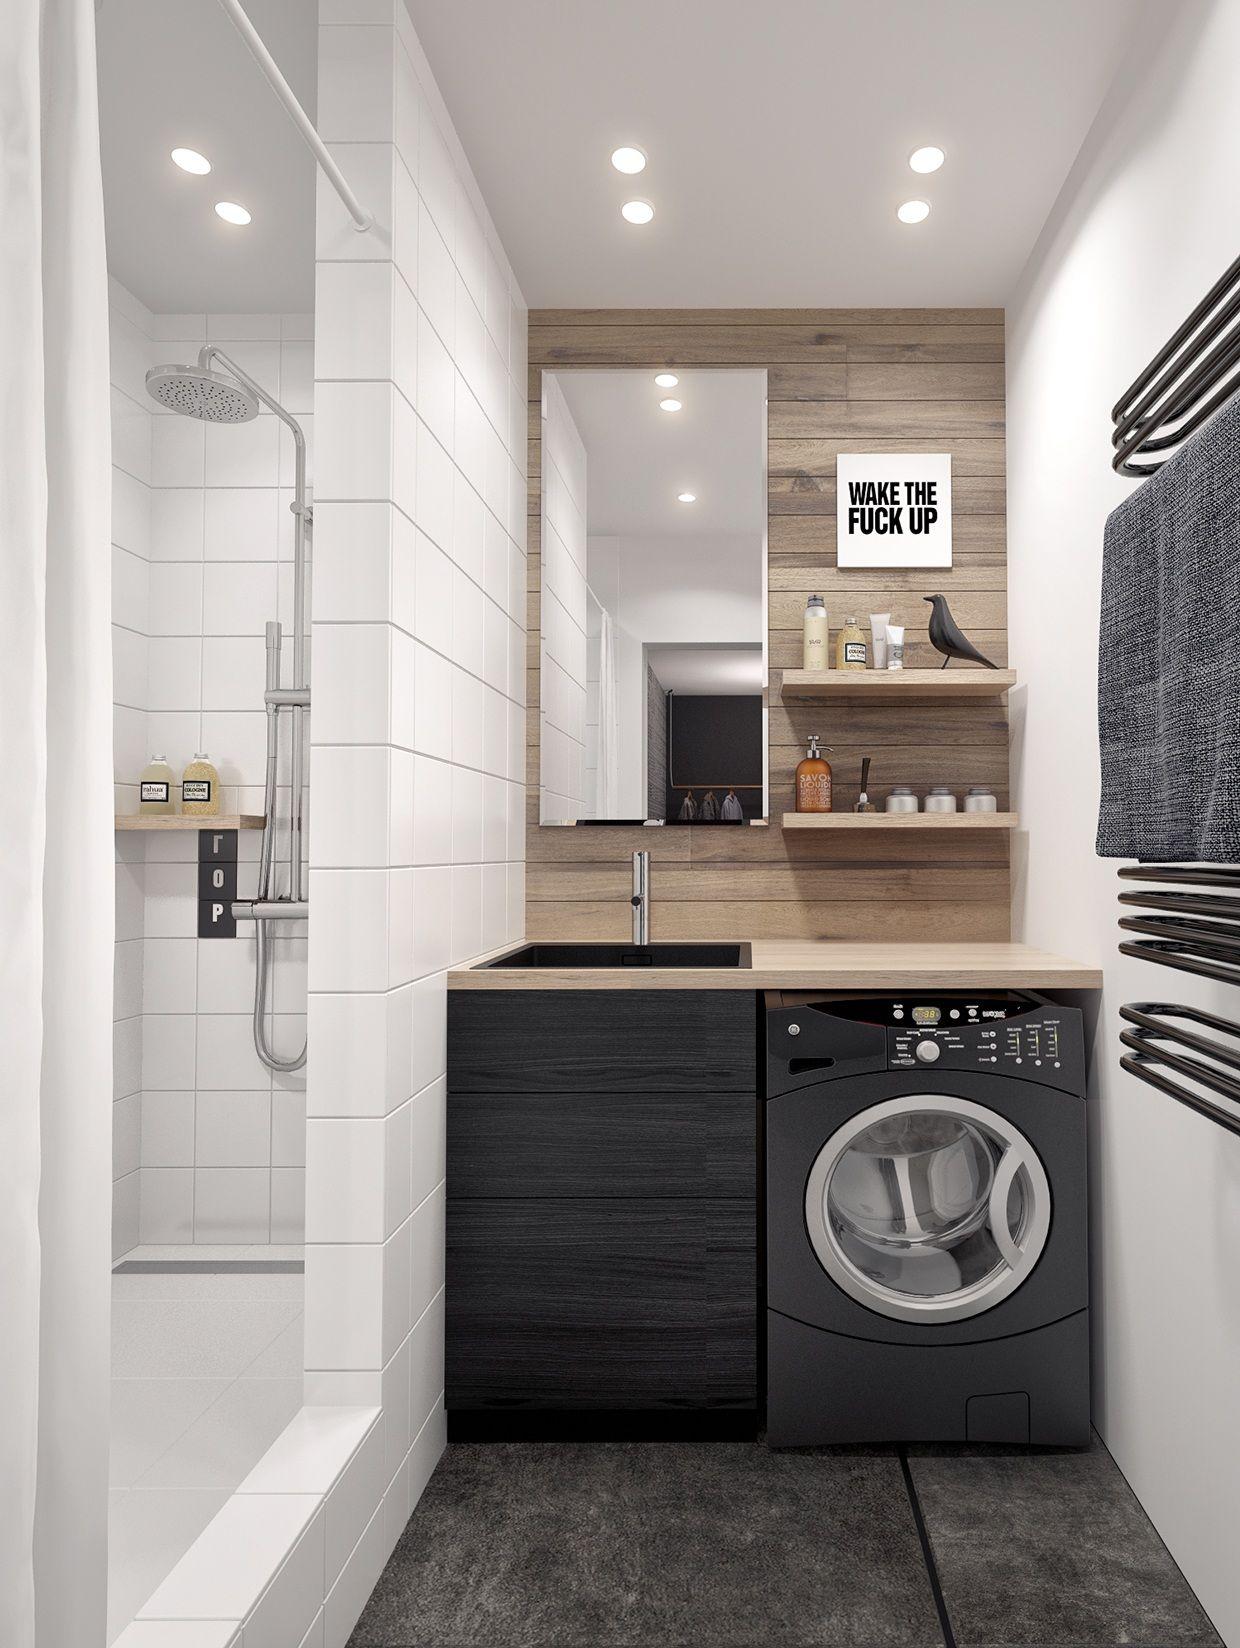 Cool bathroom heater